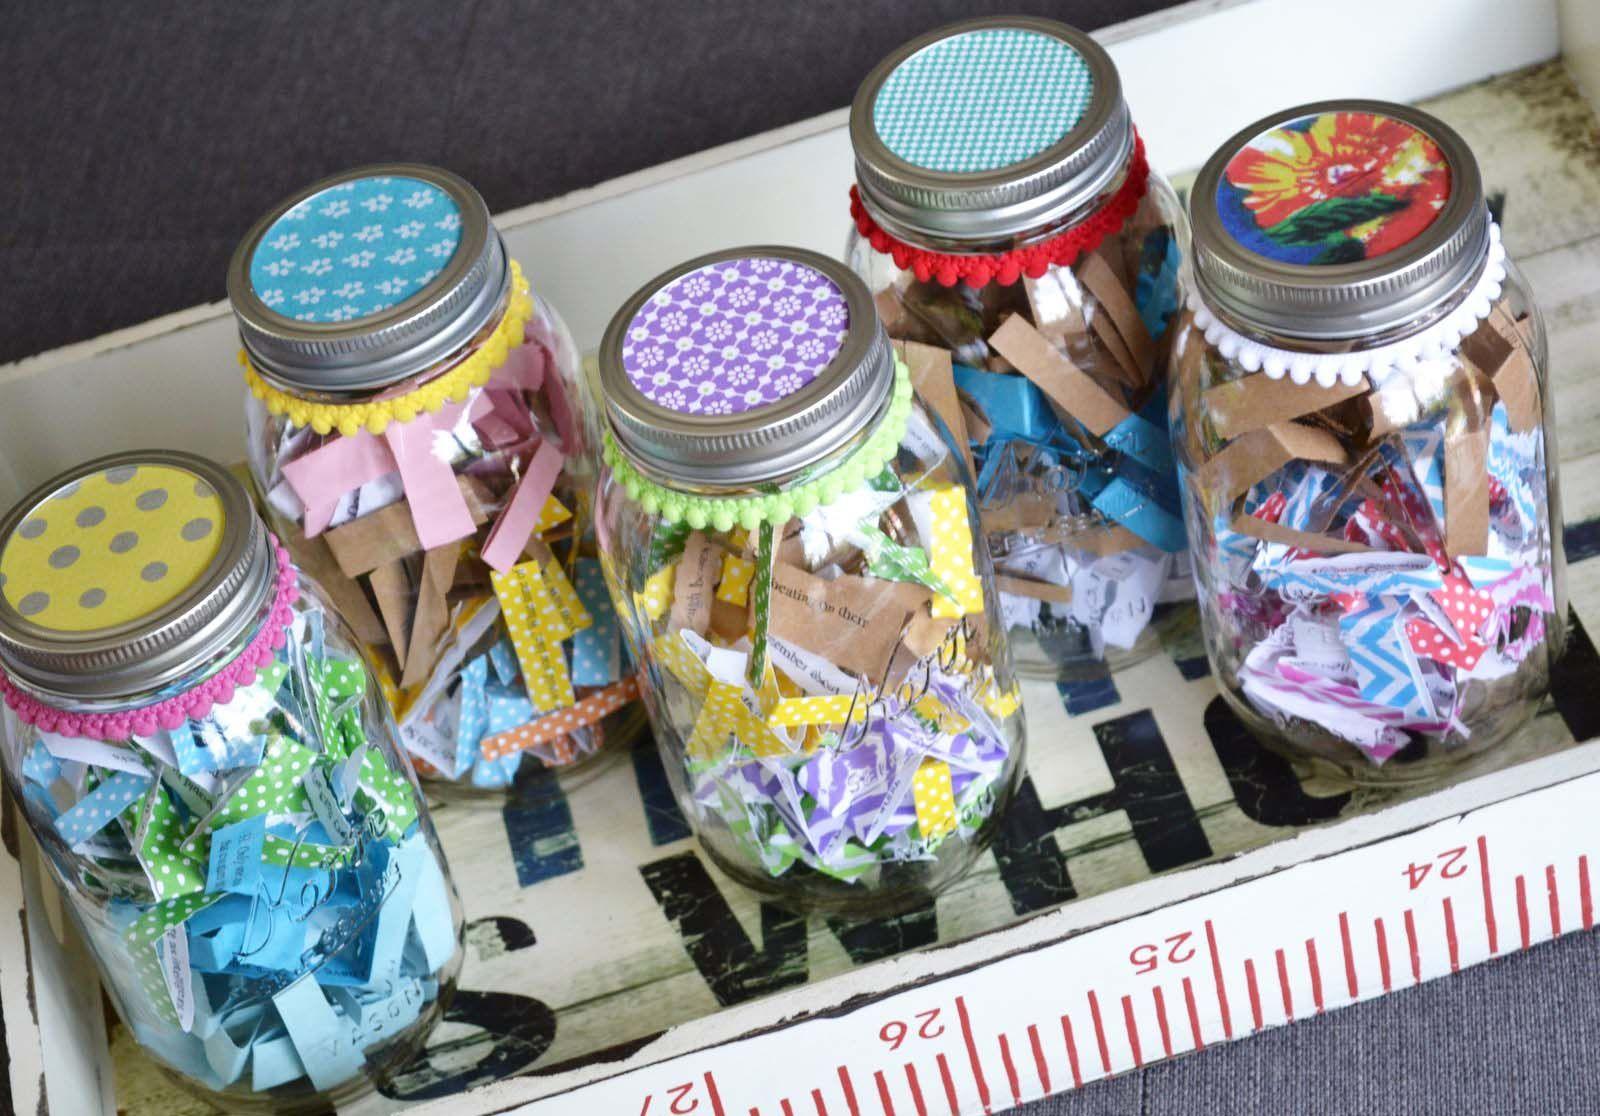 Decorate A Jar Mason Jars Decorated  Crafty  Pinterest  Mason Jar Decorating